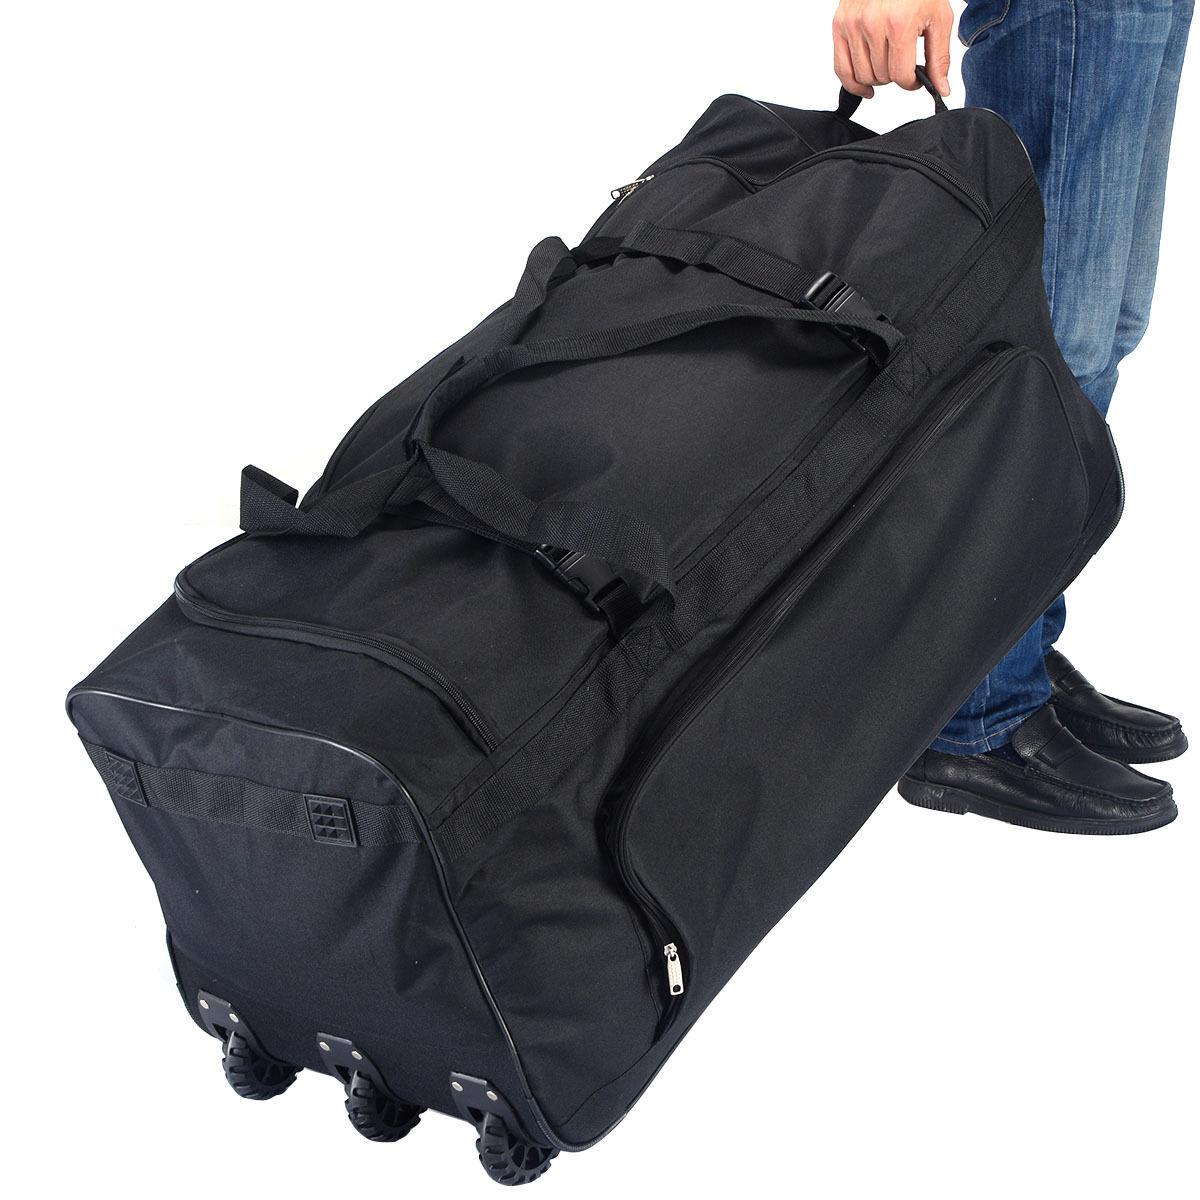 "36"" Rolling Tote Duffle Bag Wheeled Luggage Travel Duffle Suitcase Black New"